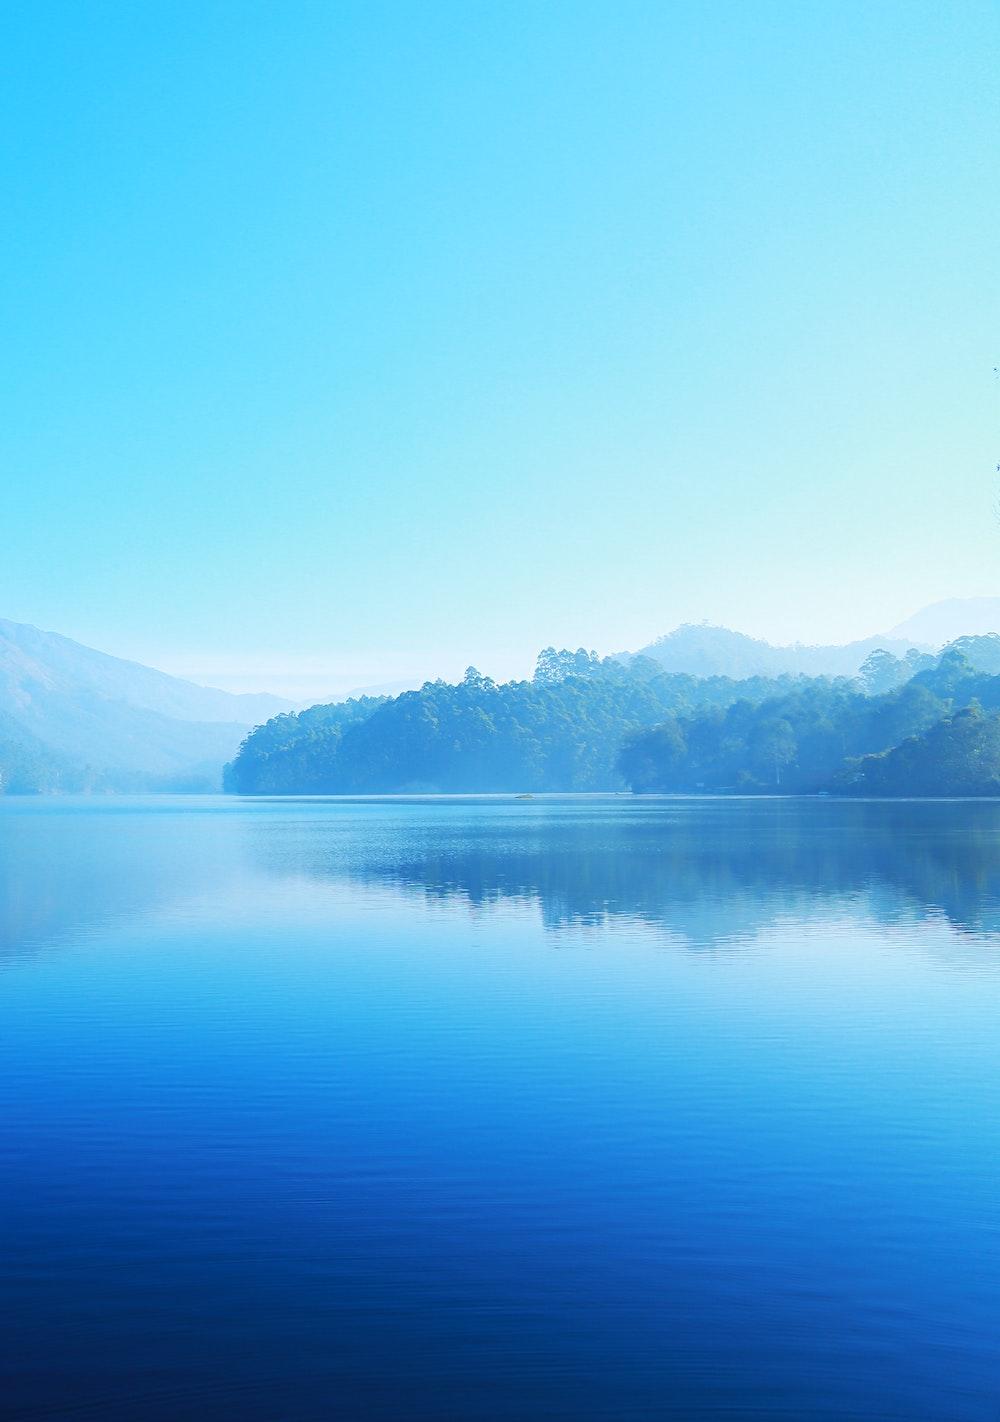 blue-iphone-wallpaper-lake-40465.jpg